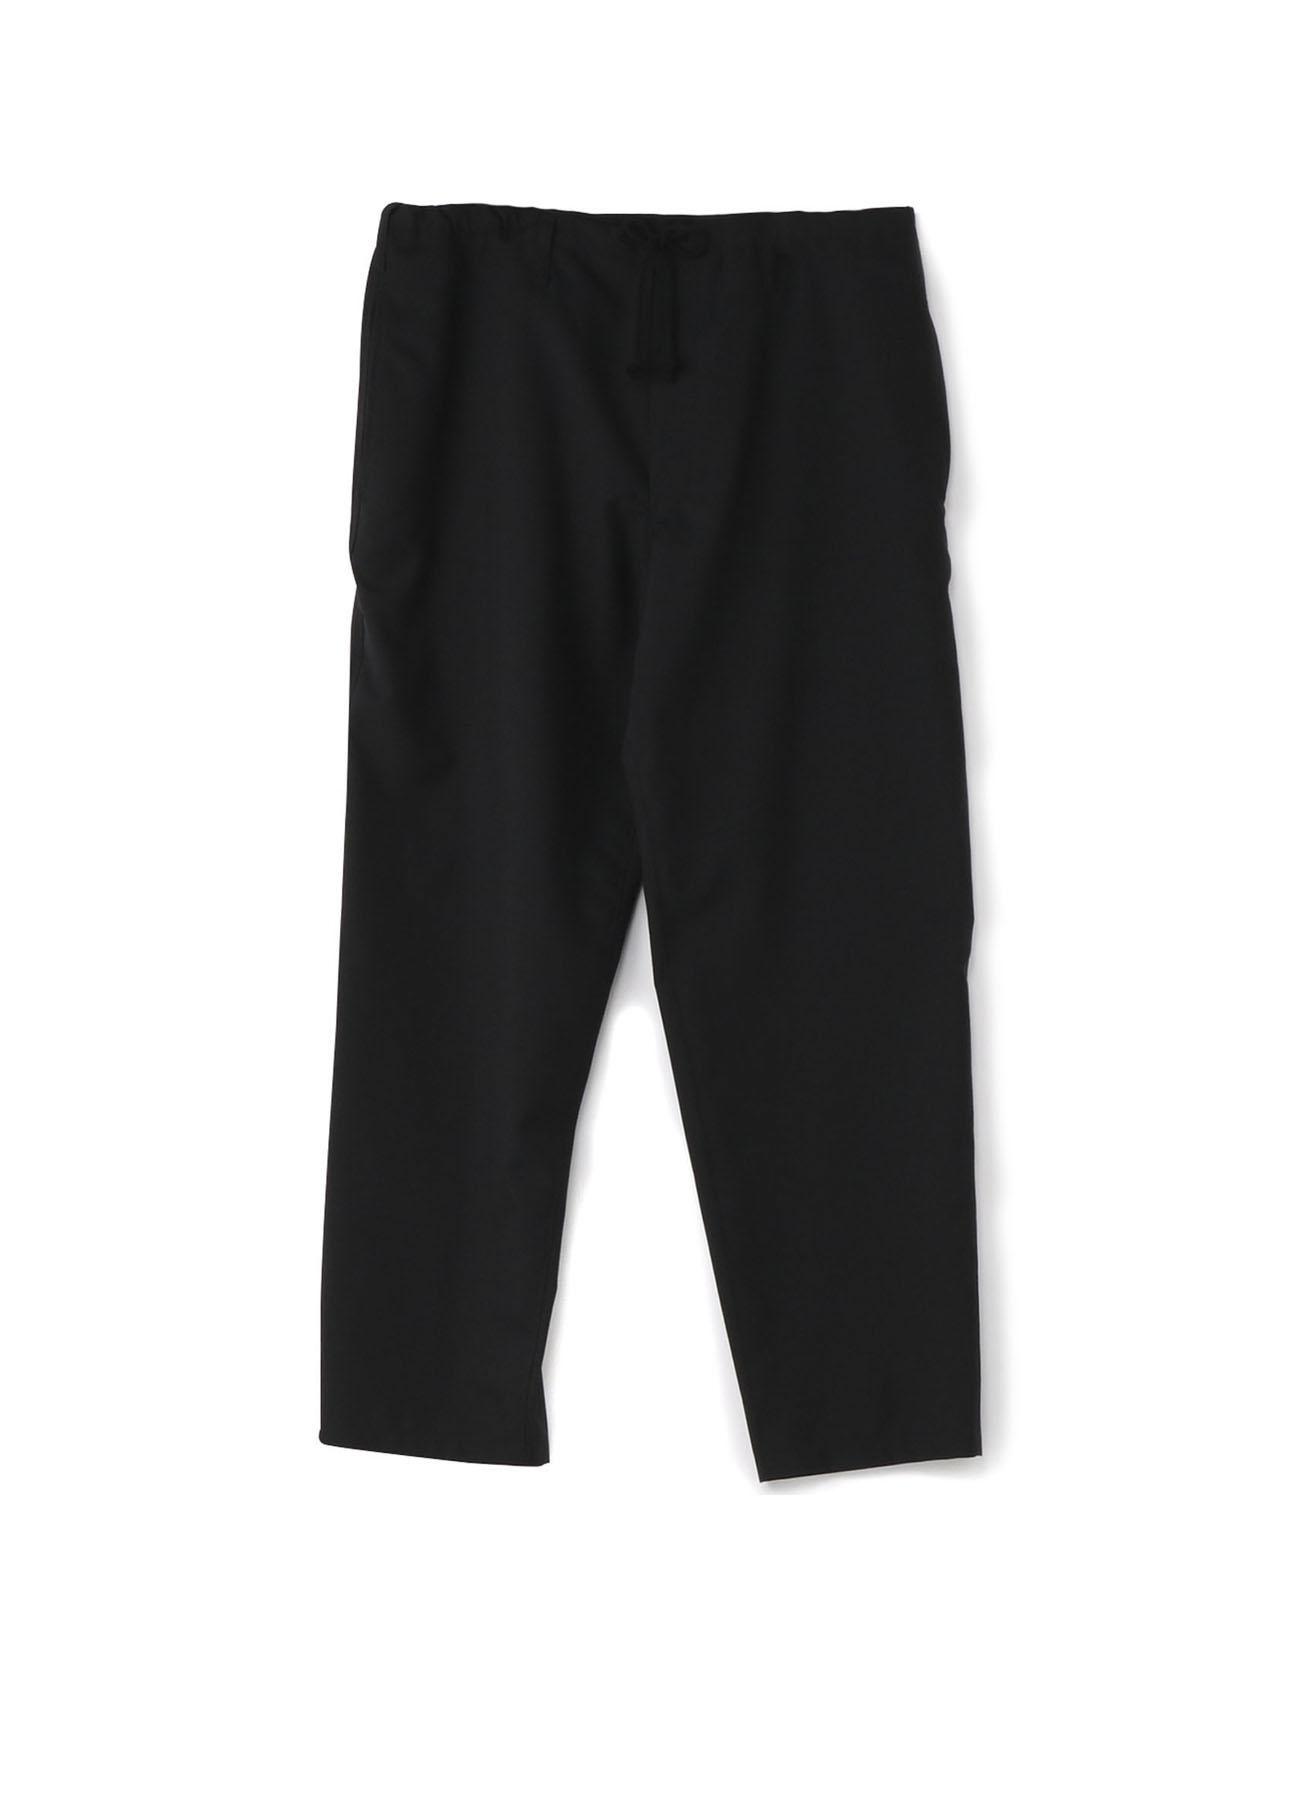 No.7 腰部绳裤 羊毛薄布料